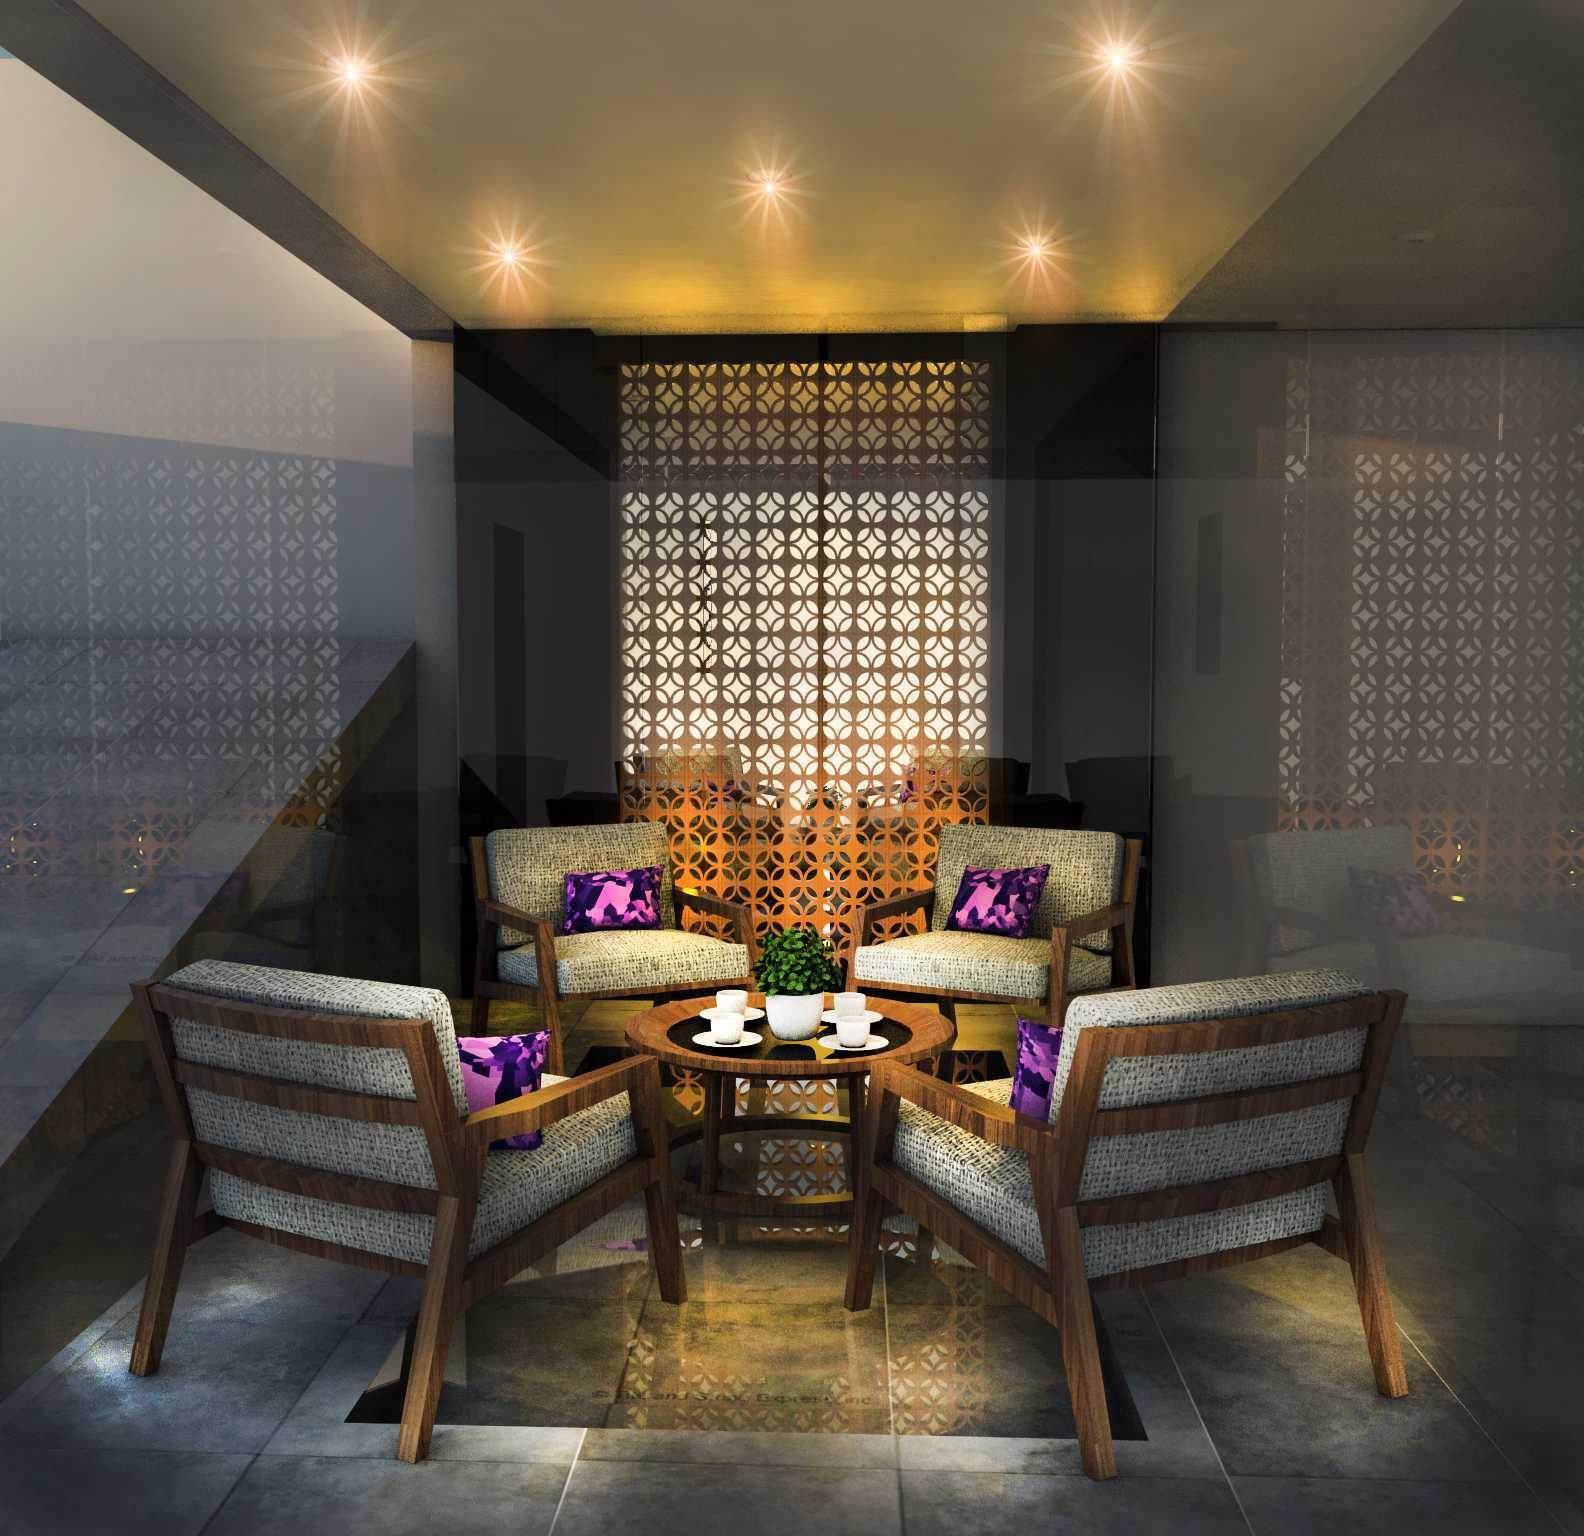 Manon Design Studio Ario Private Villa Interior Sukawati, Guwang, Sukawati, Kabupaten Gianyar, Bali, Indonesia Sukawati, Guwang, Sukawati, Kabupaten Gianyar, Bali, Indonesia Guest-Room   37895